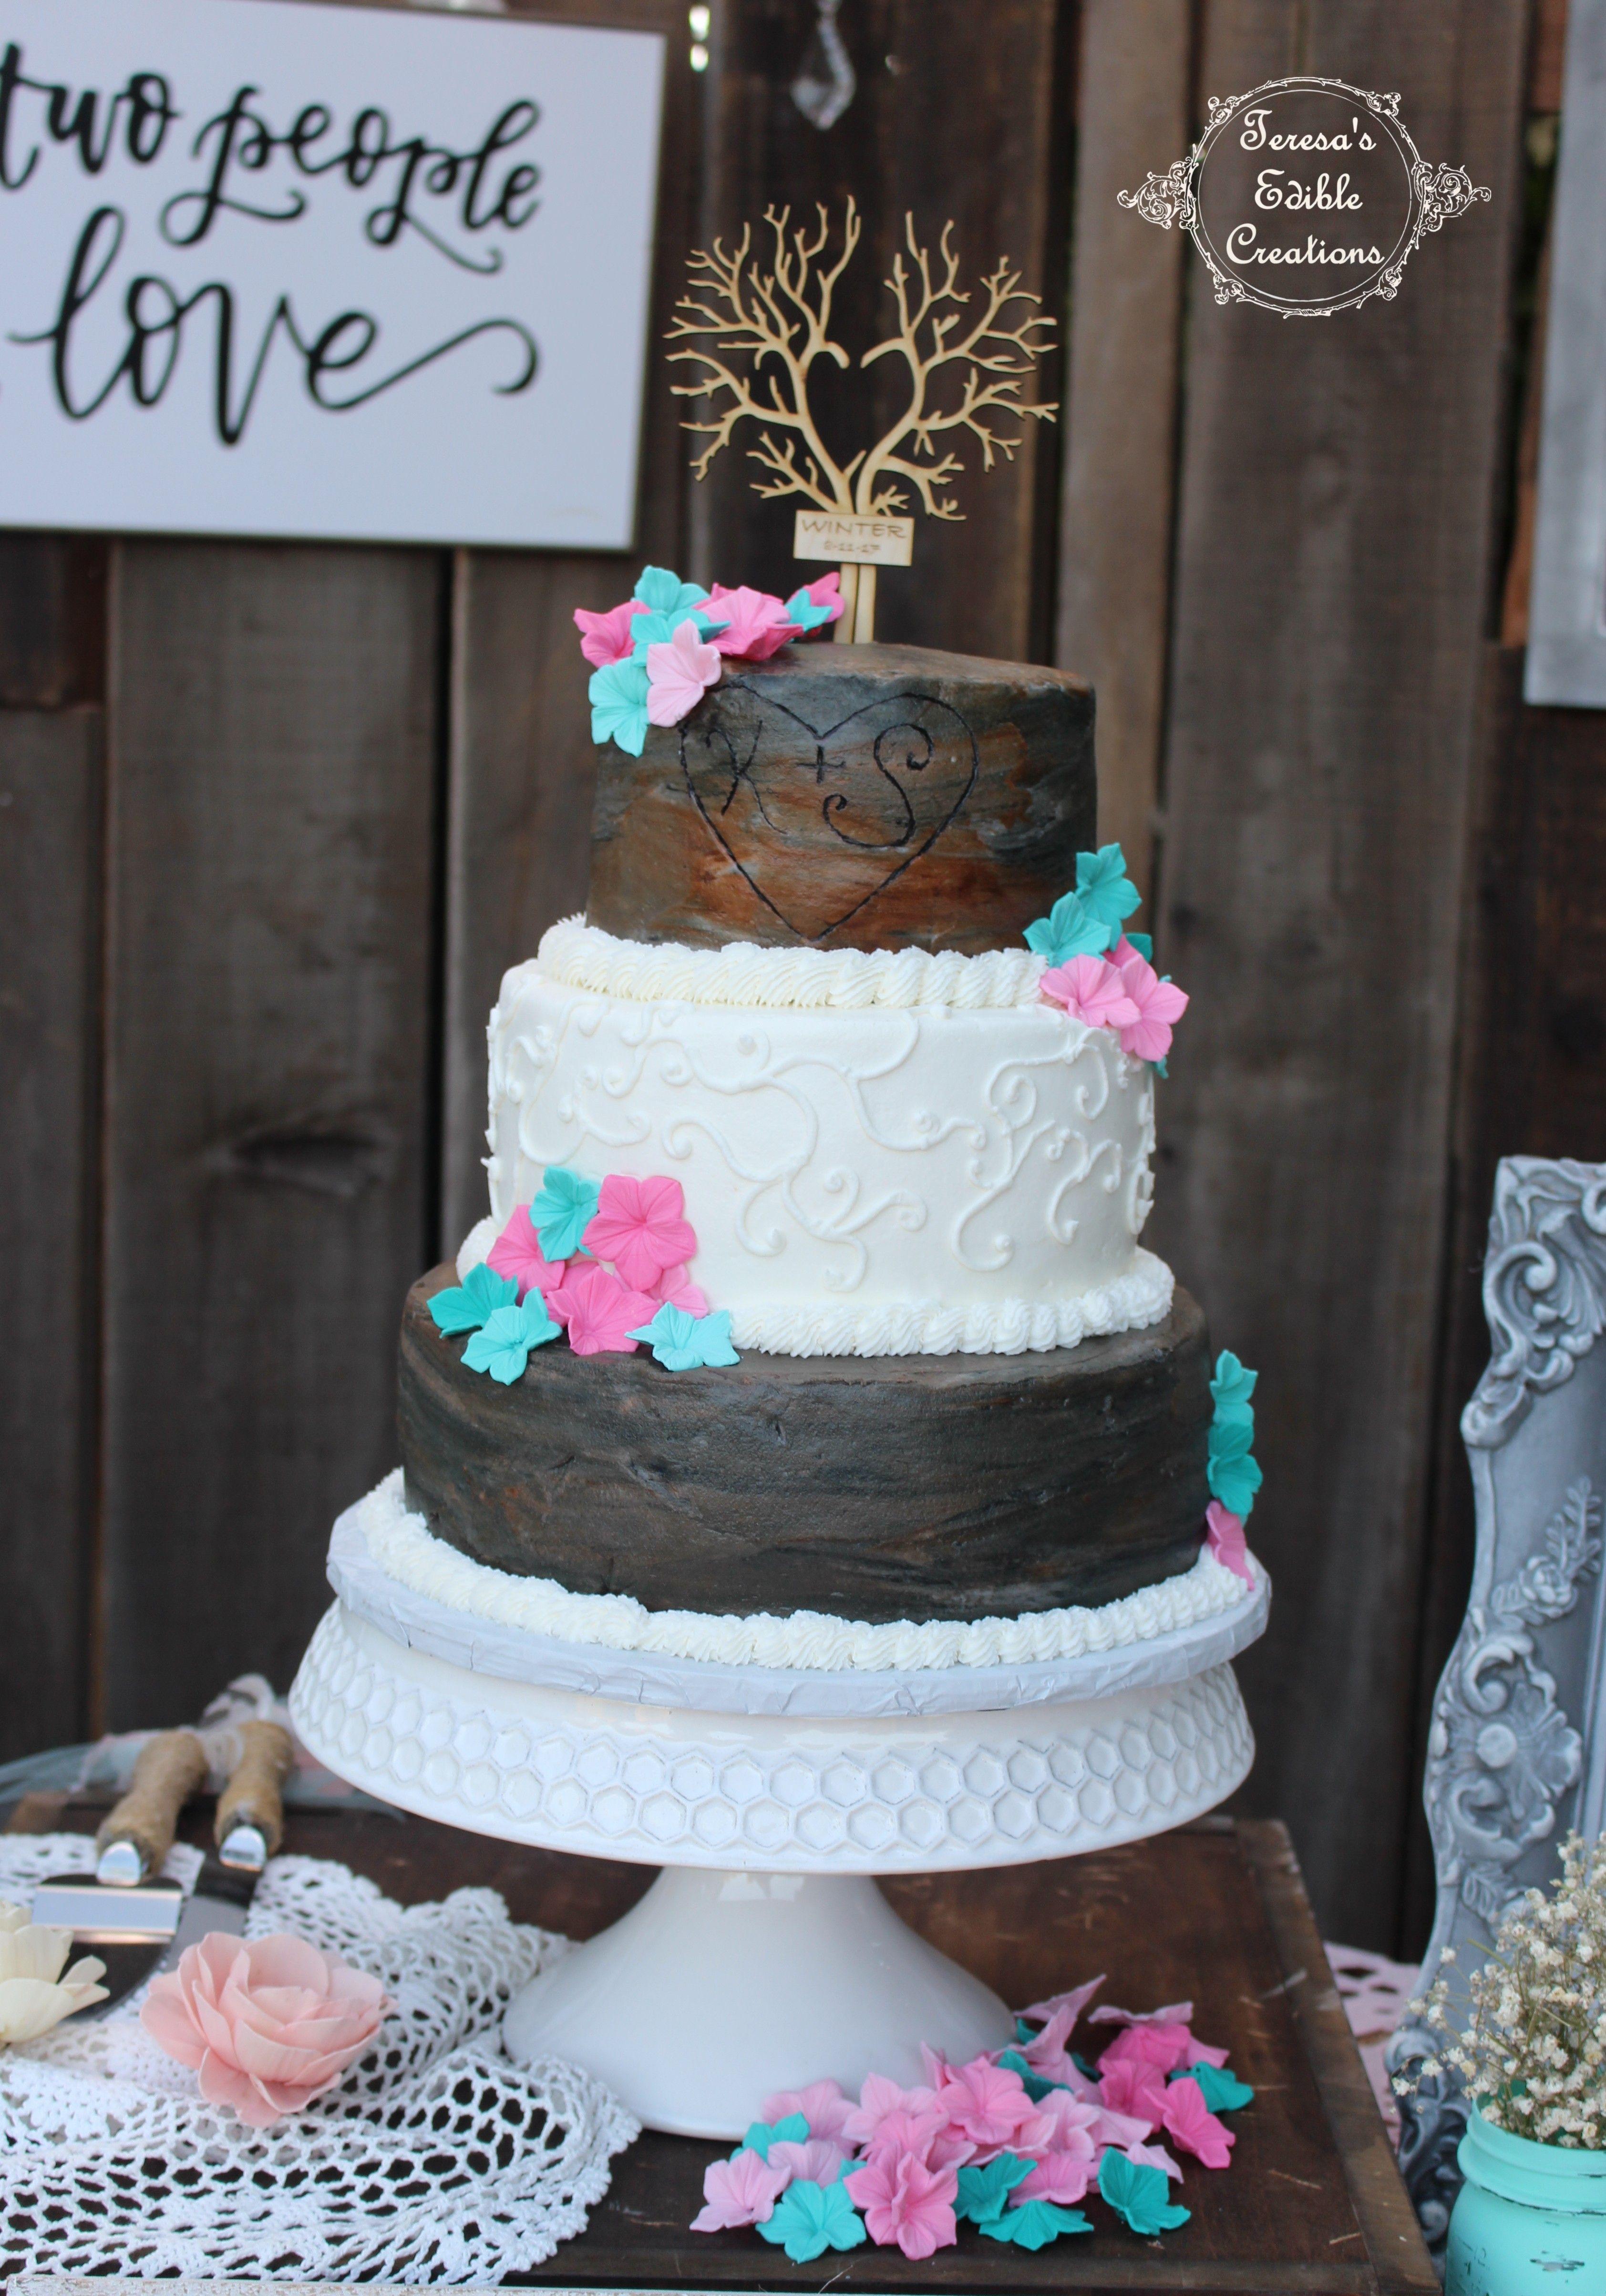 Wedding Caketree Bark With Engraved Heart My Cake Creations - Wedding Cake Tree Bark